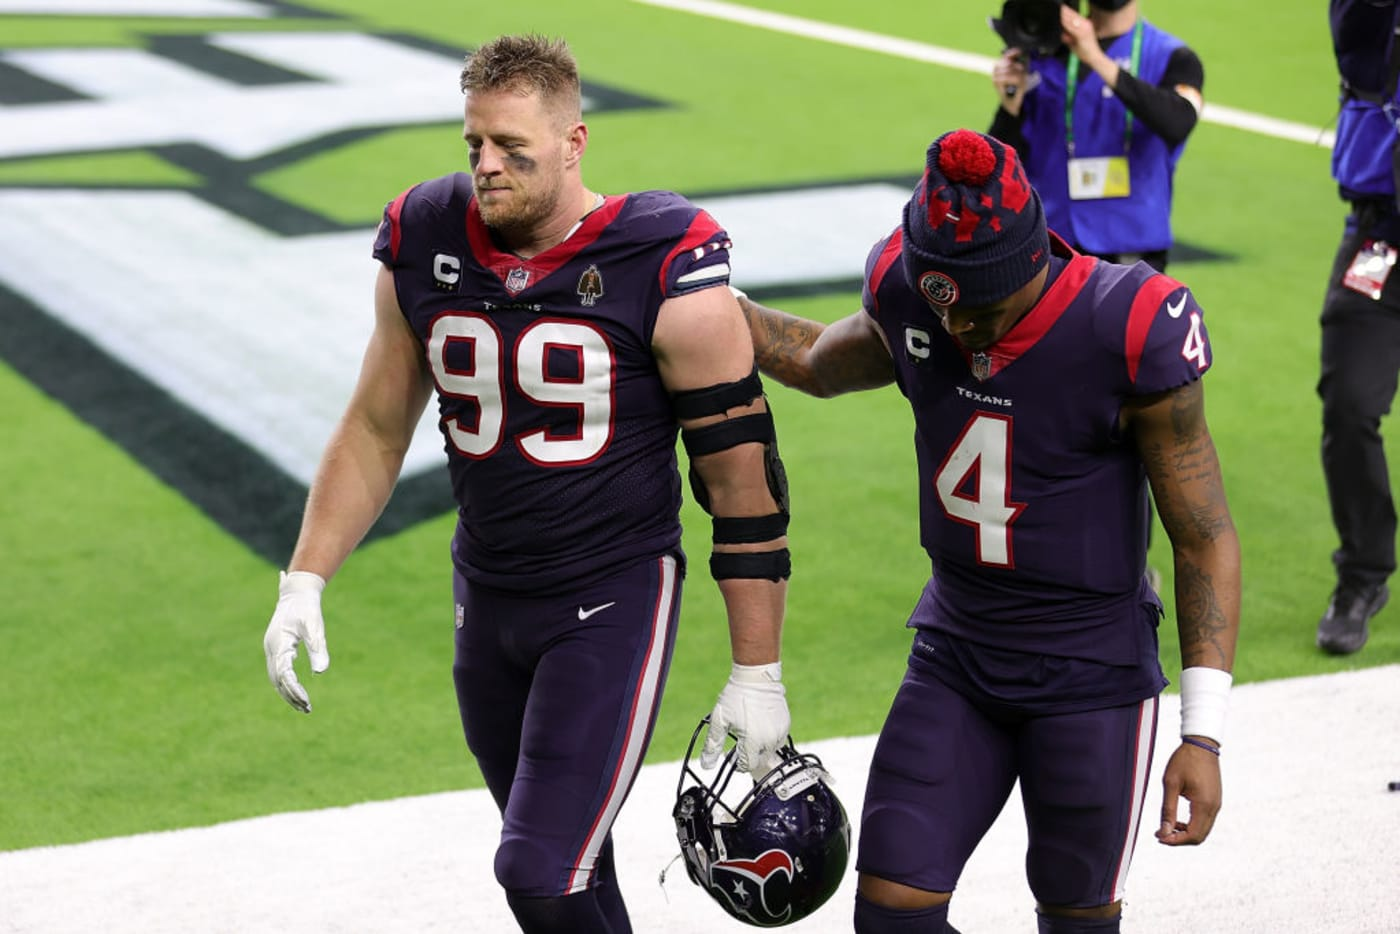 JJ Watt Deshaun Watson Texans Titans 2021